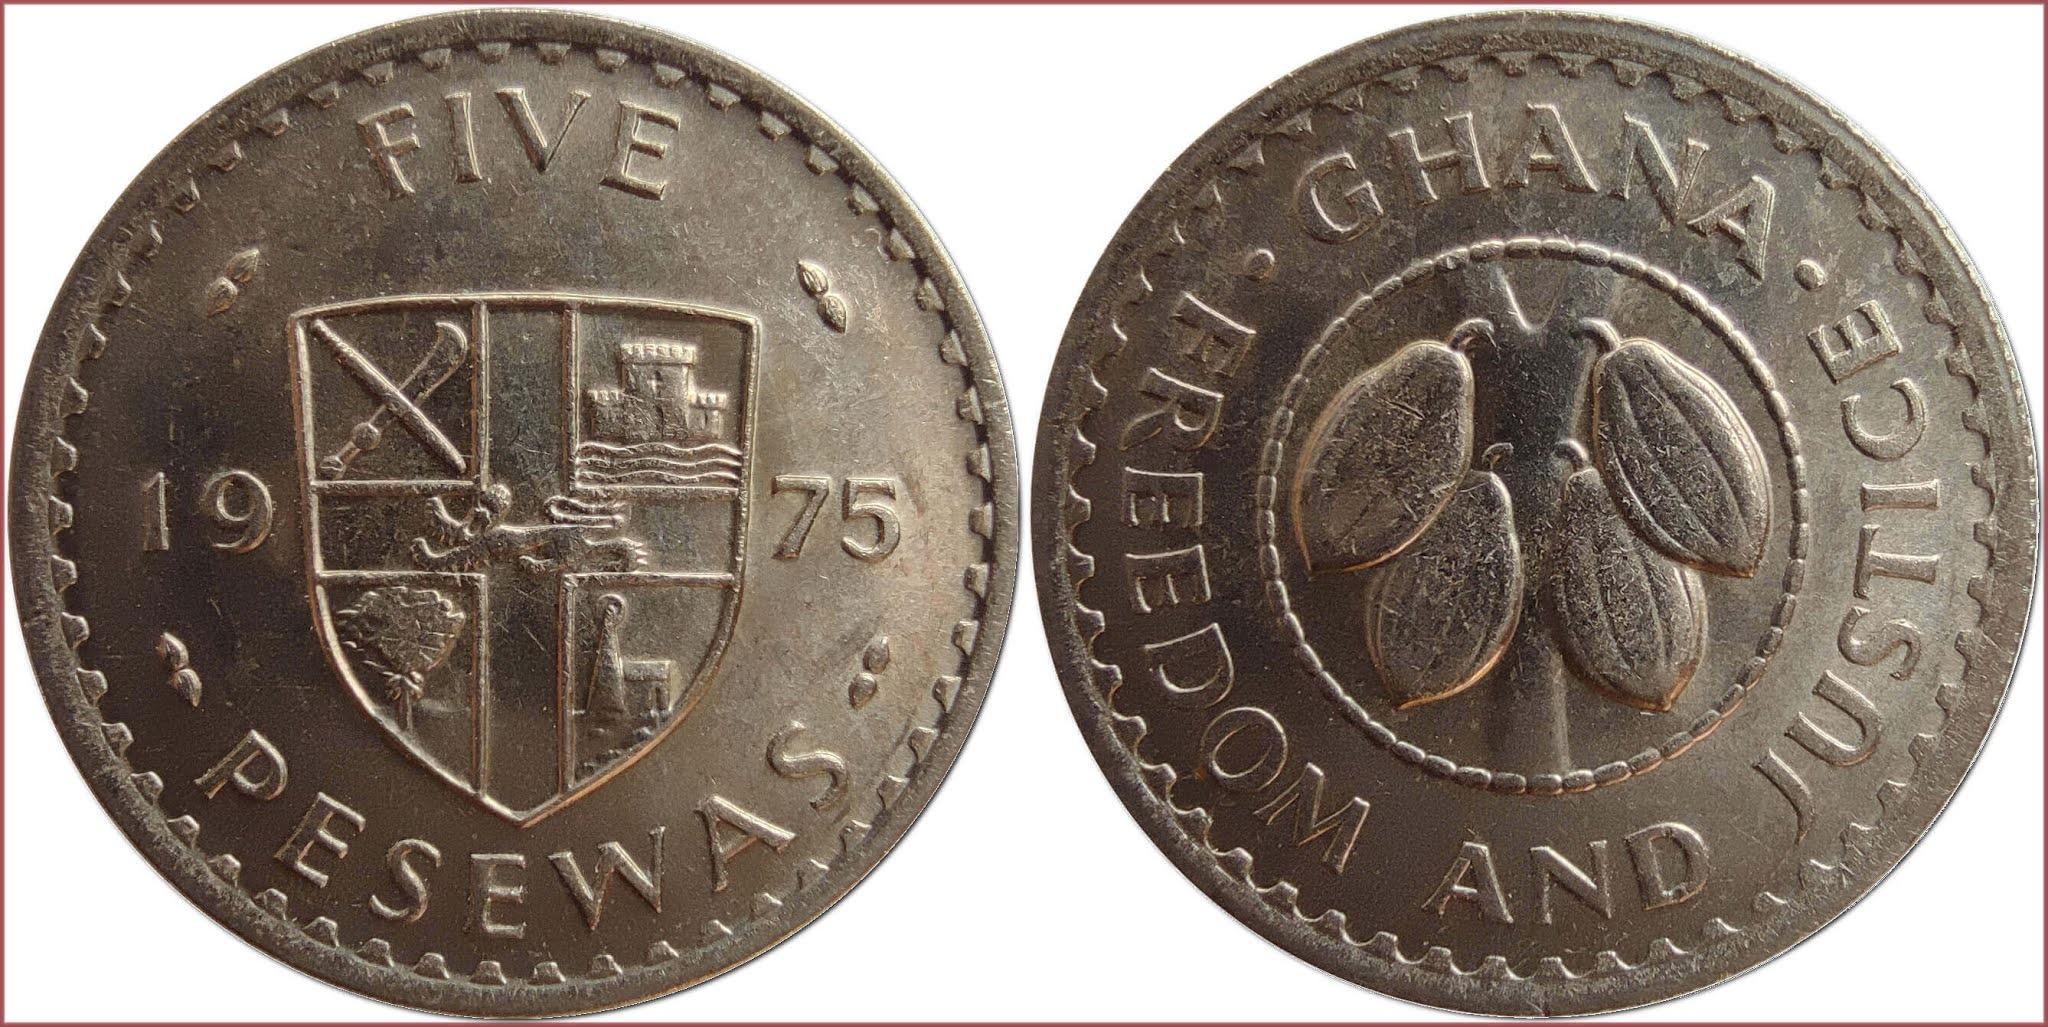 5 pesewa, 1975: Republic of Ghana